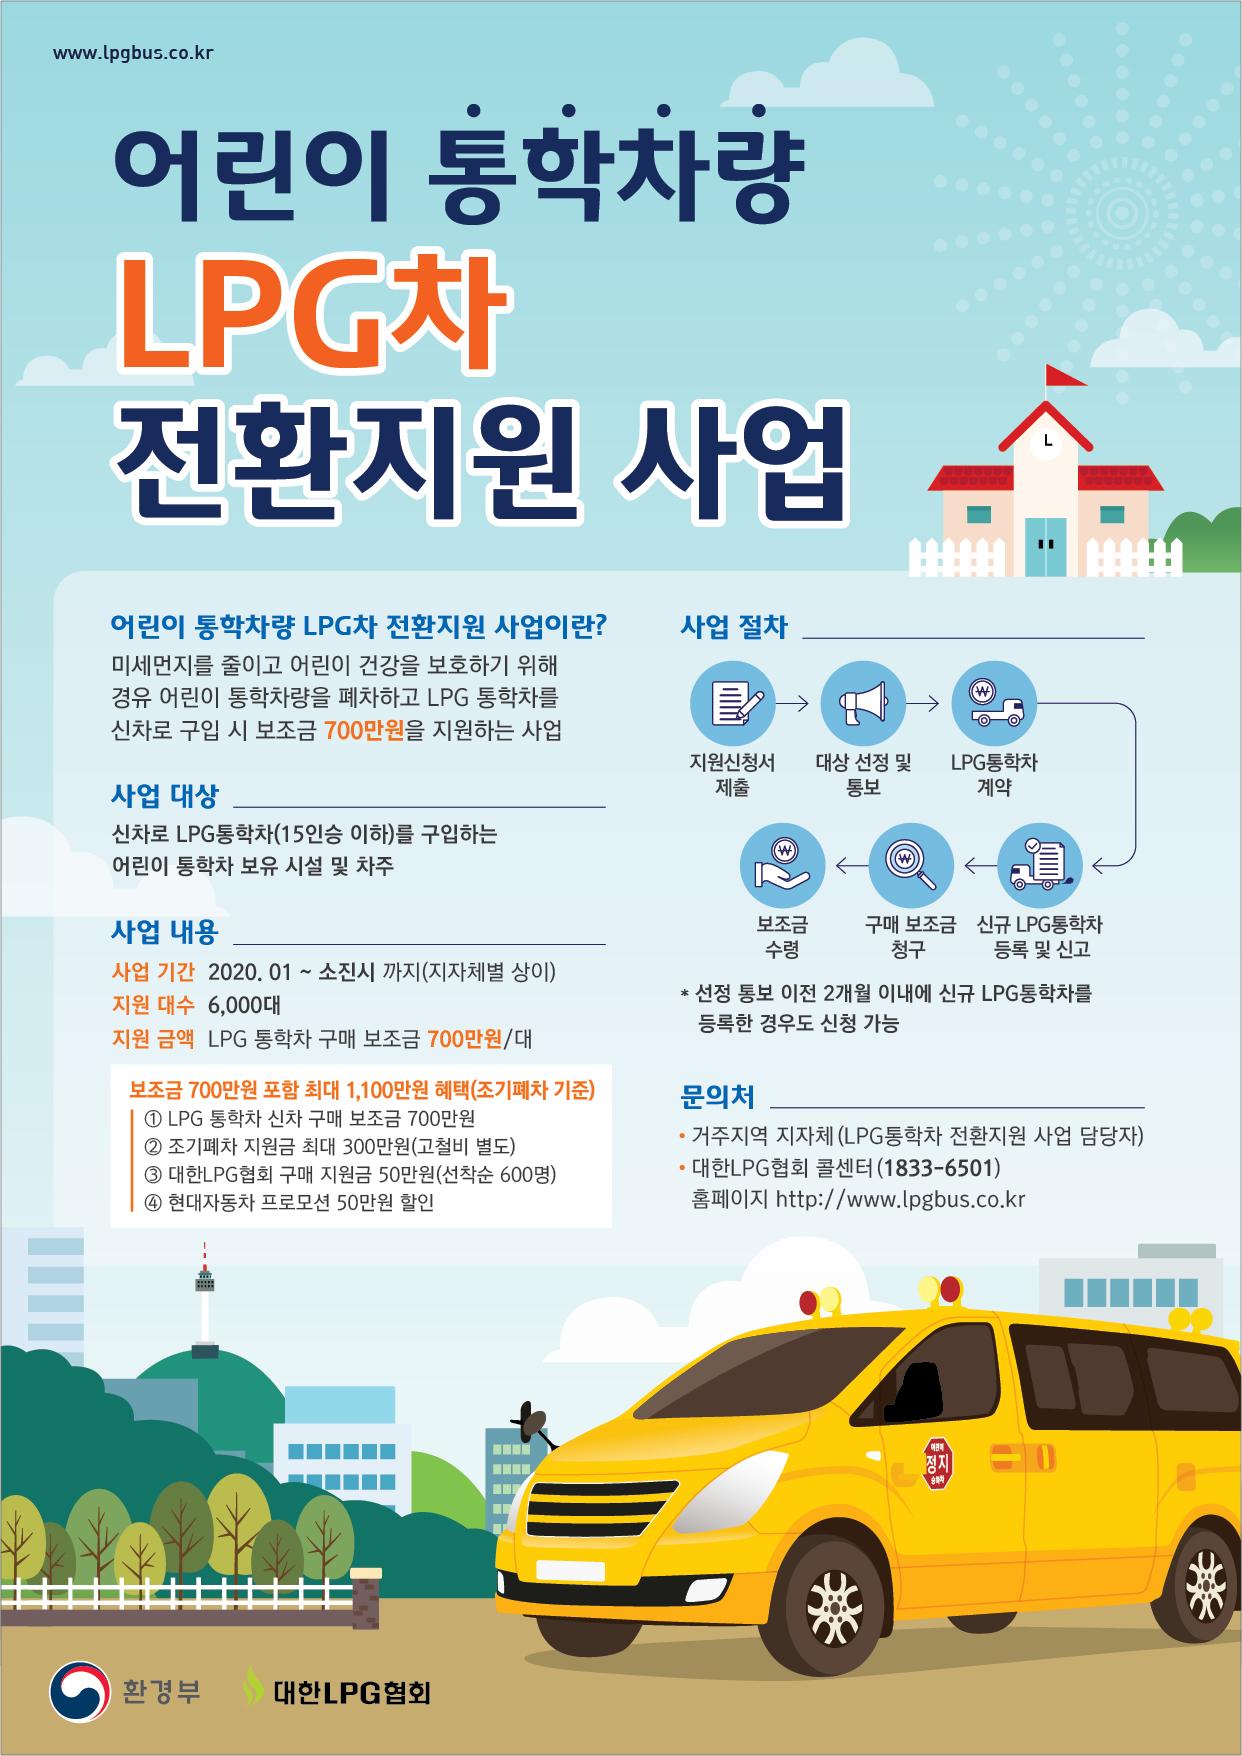 LPG통학차량 리플릿_PDF(양면)_페이지_1.png